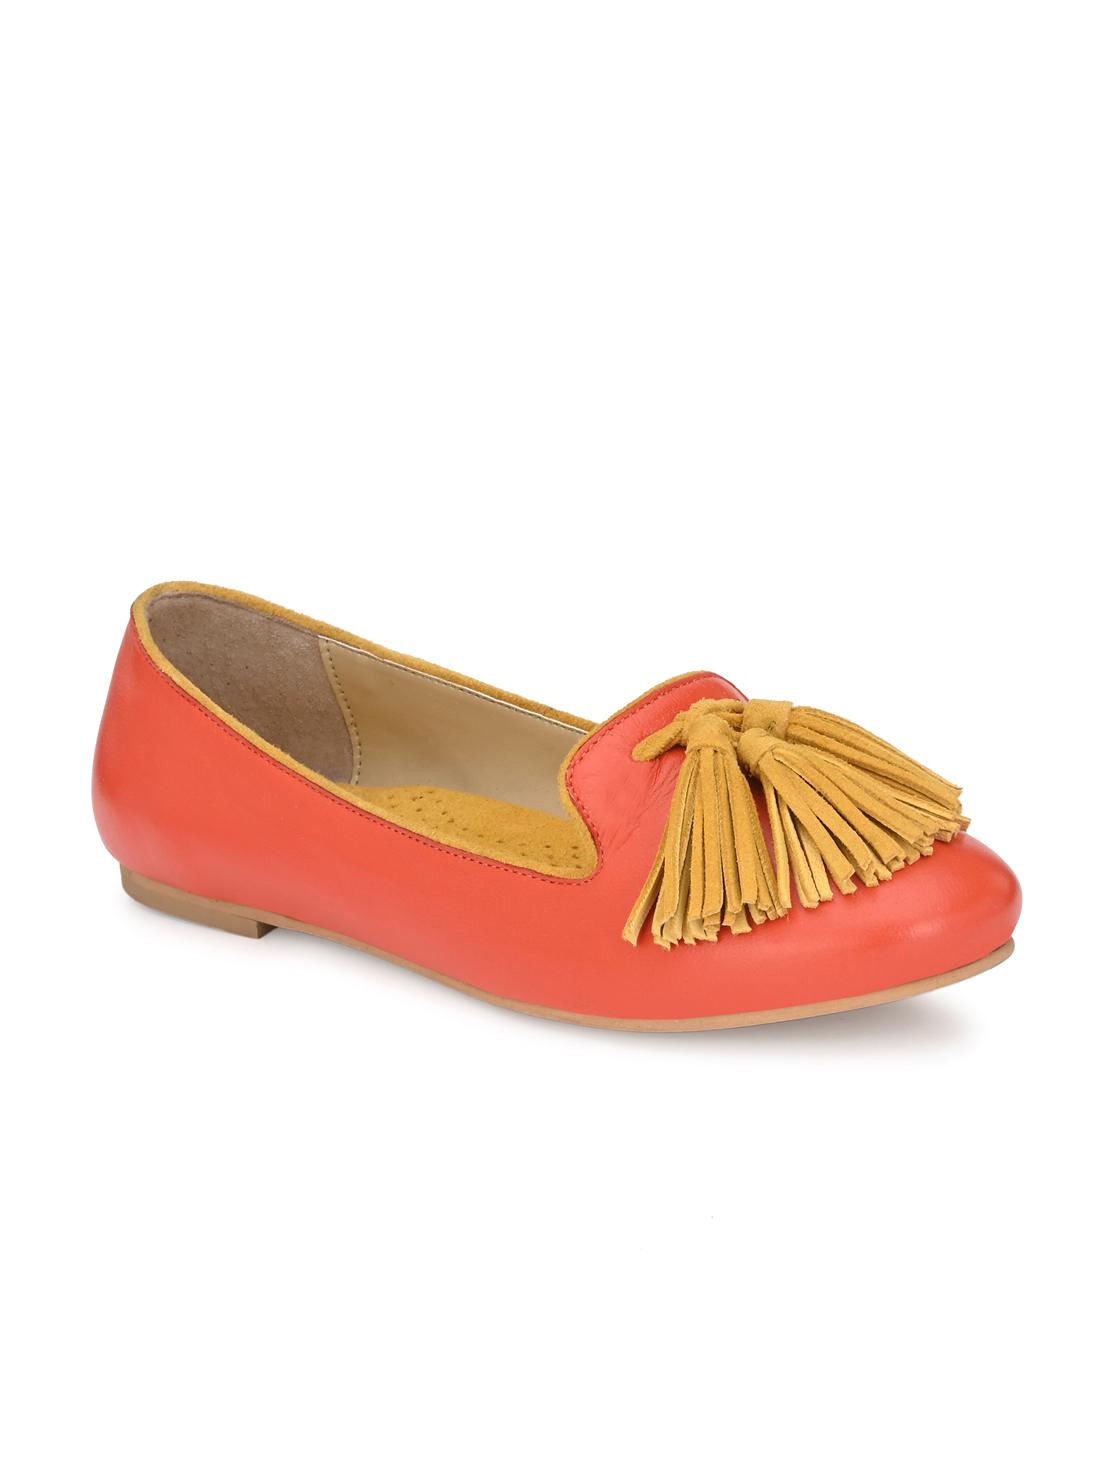 AADY AUSTIN | Aady Austin Women's Trendy Orange Round Toe Flats